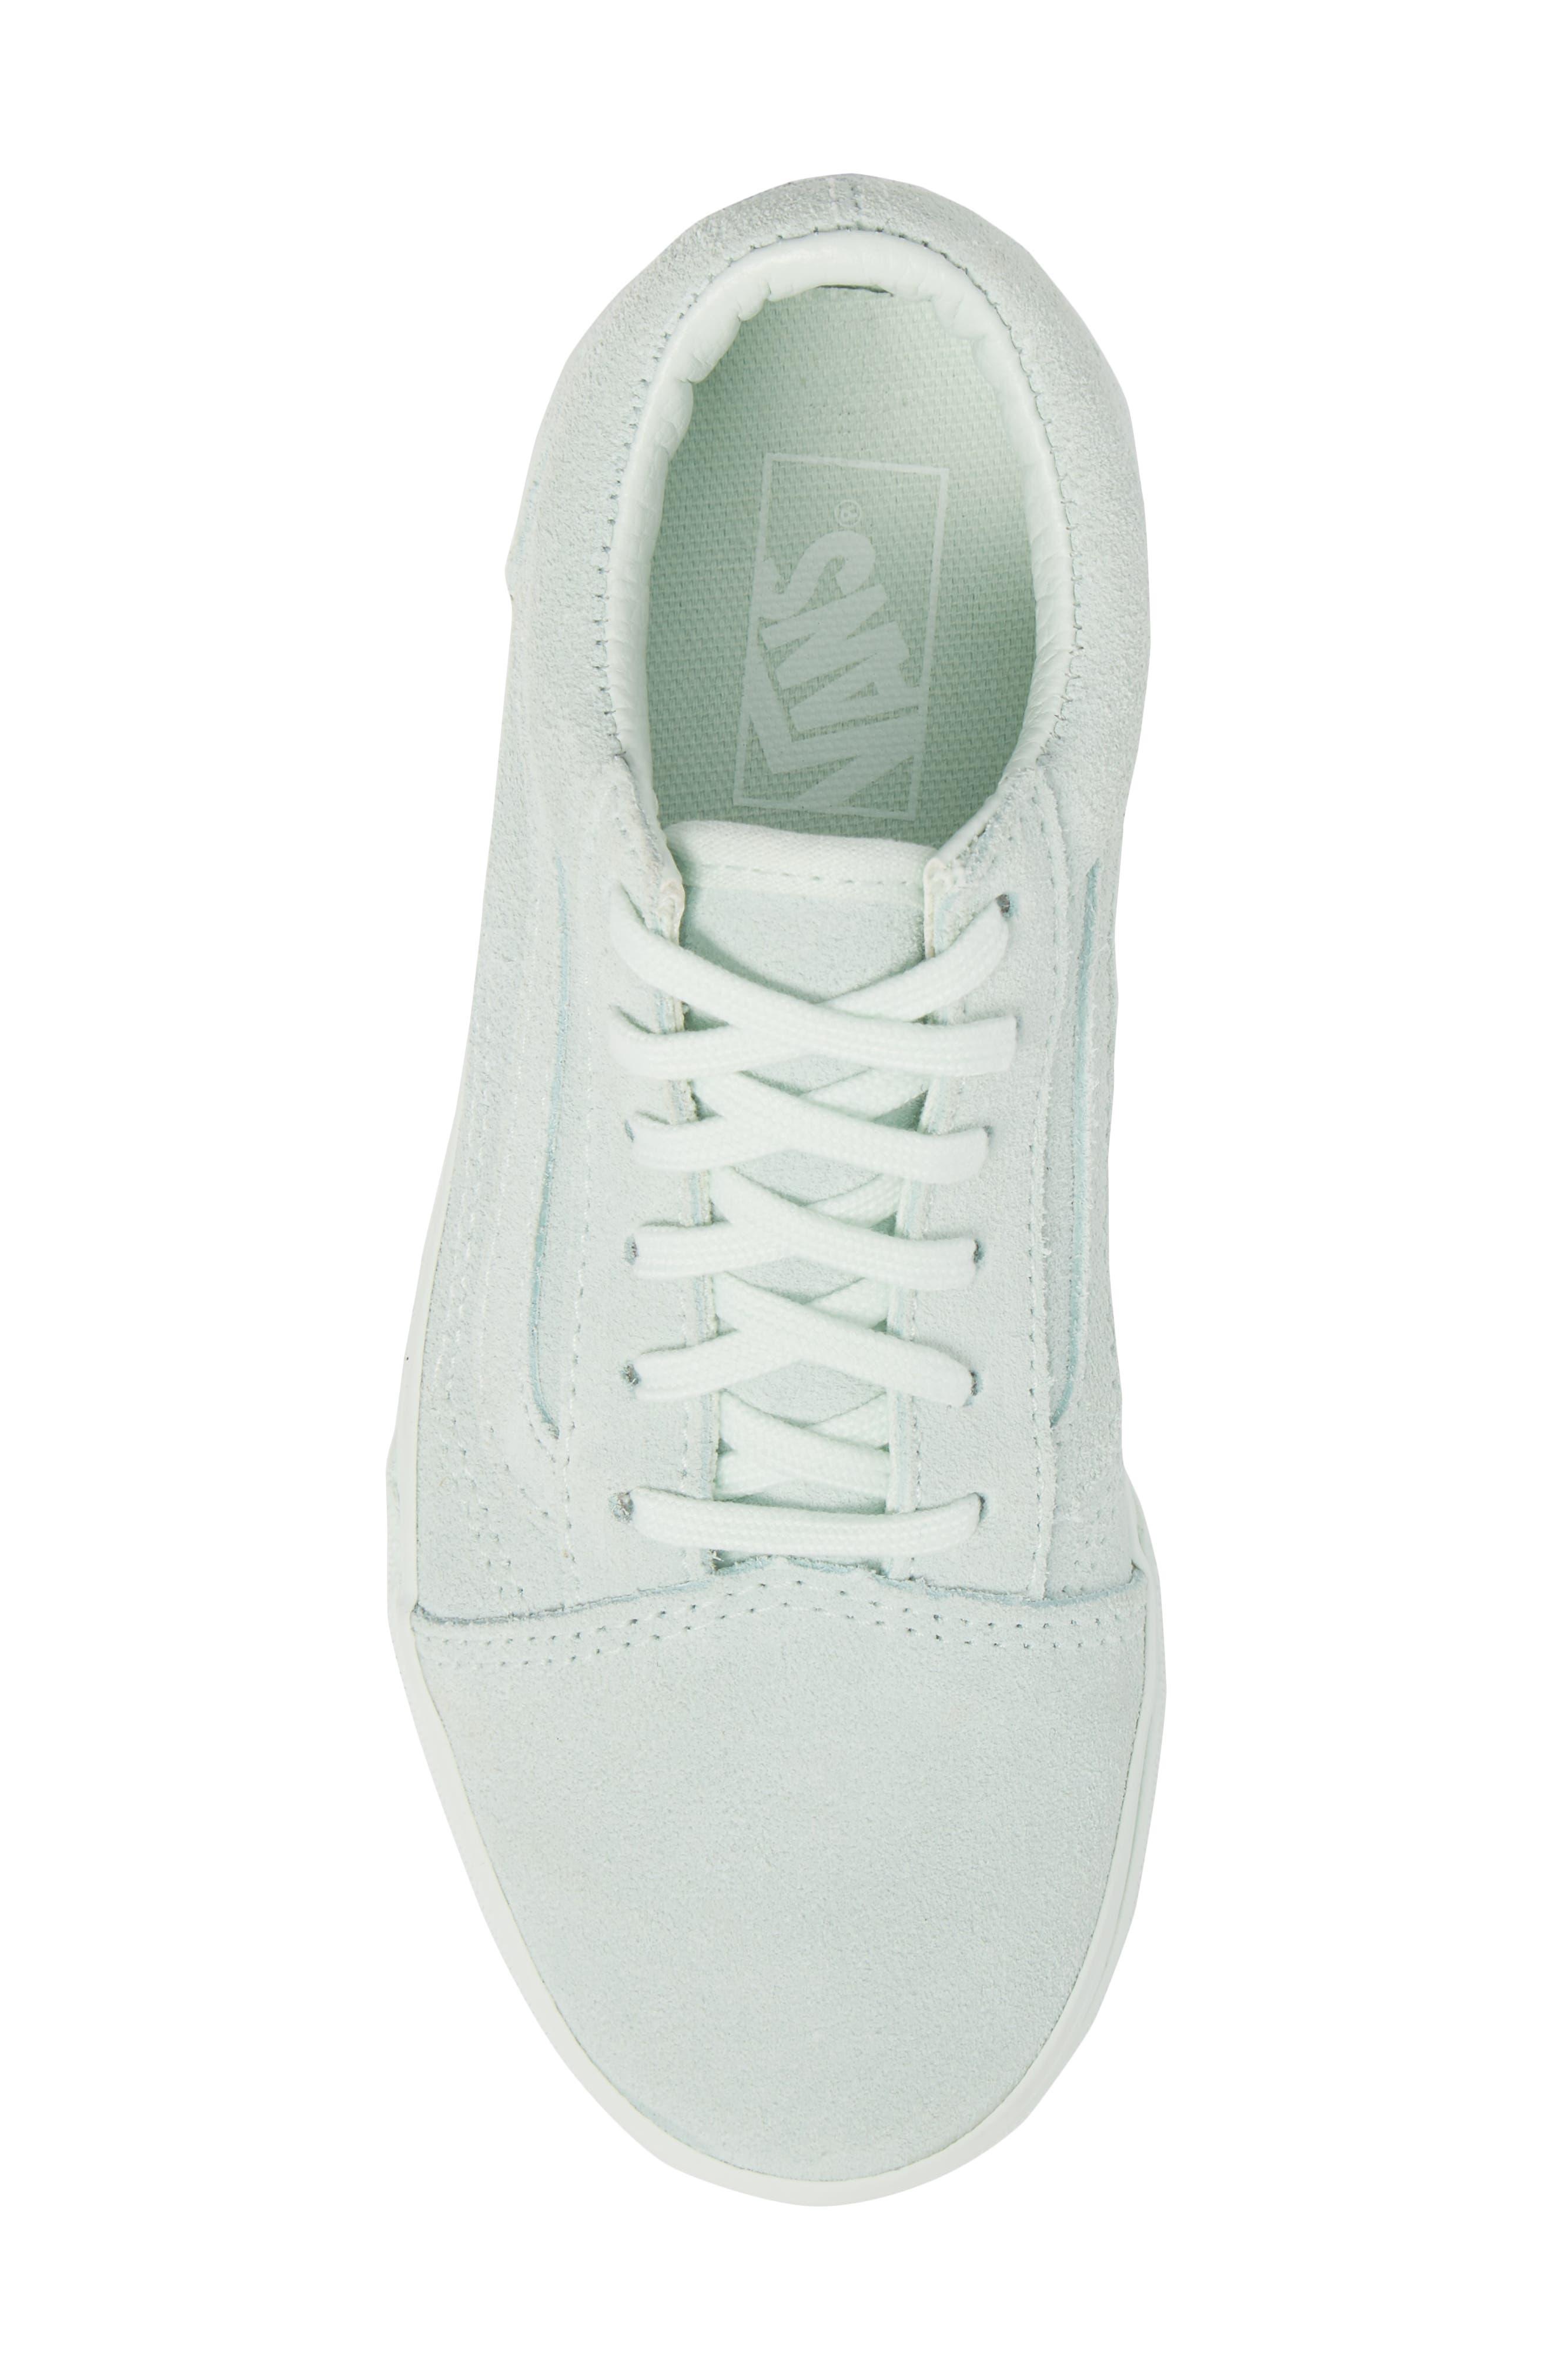 Old Skool Low Top Sneaker,                             Alternate thumbnail 5, color,                             300